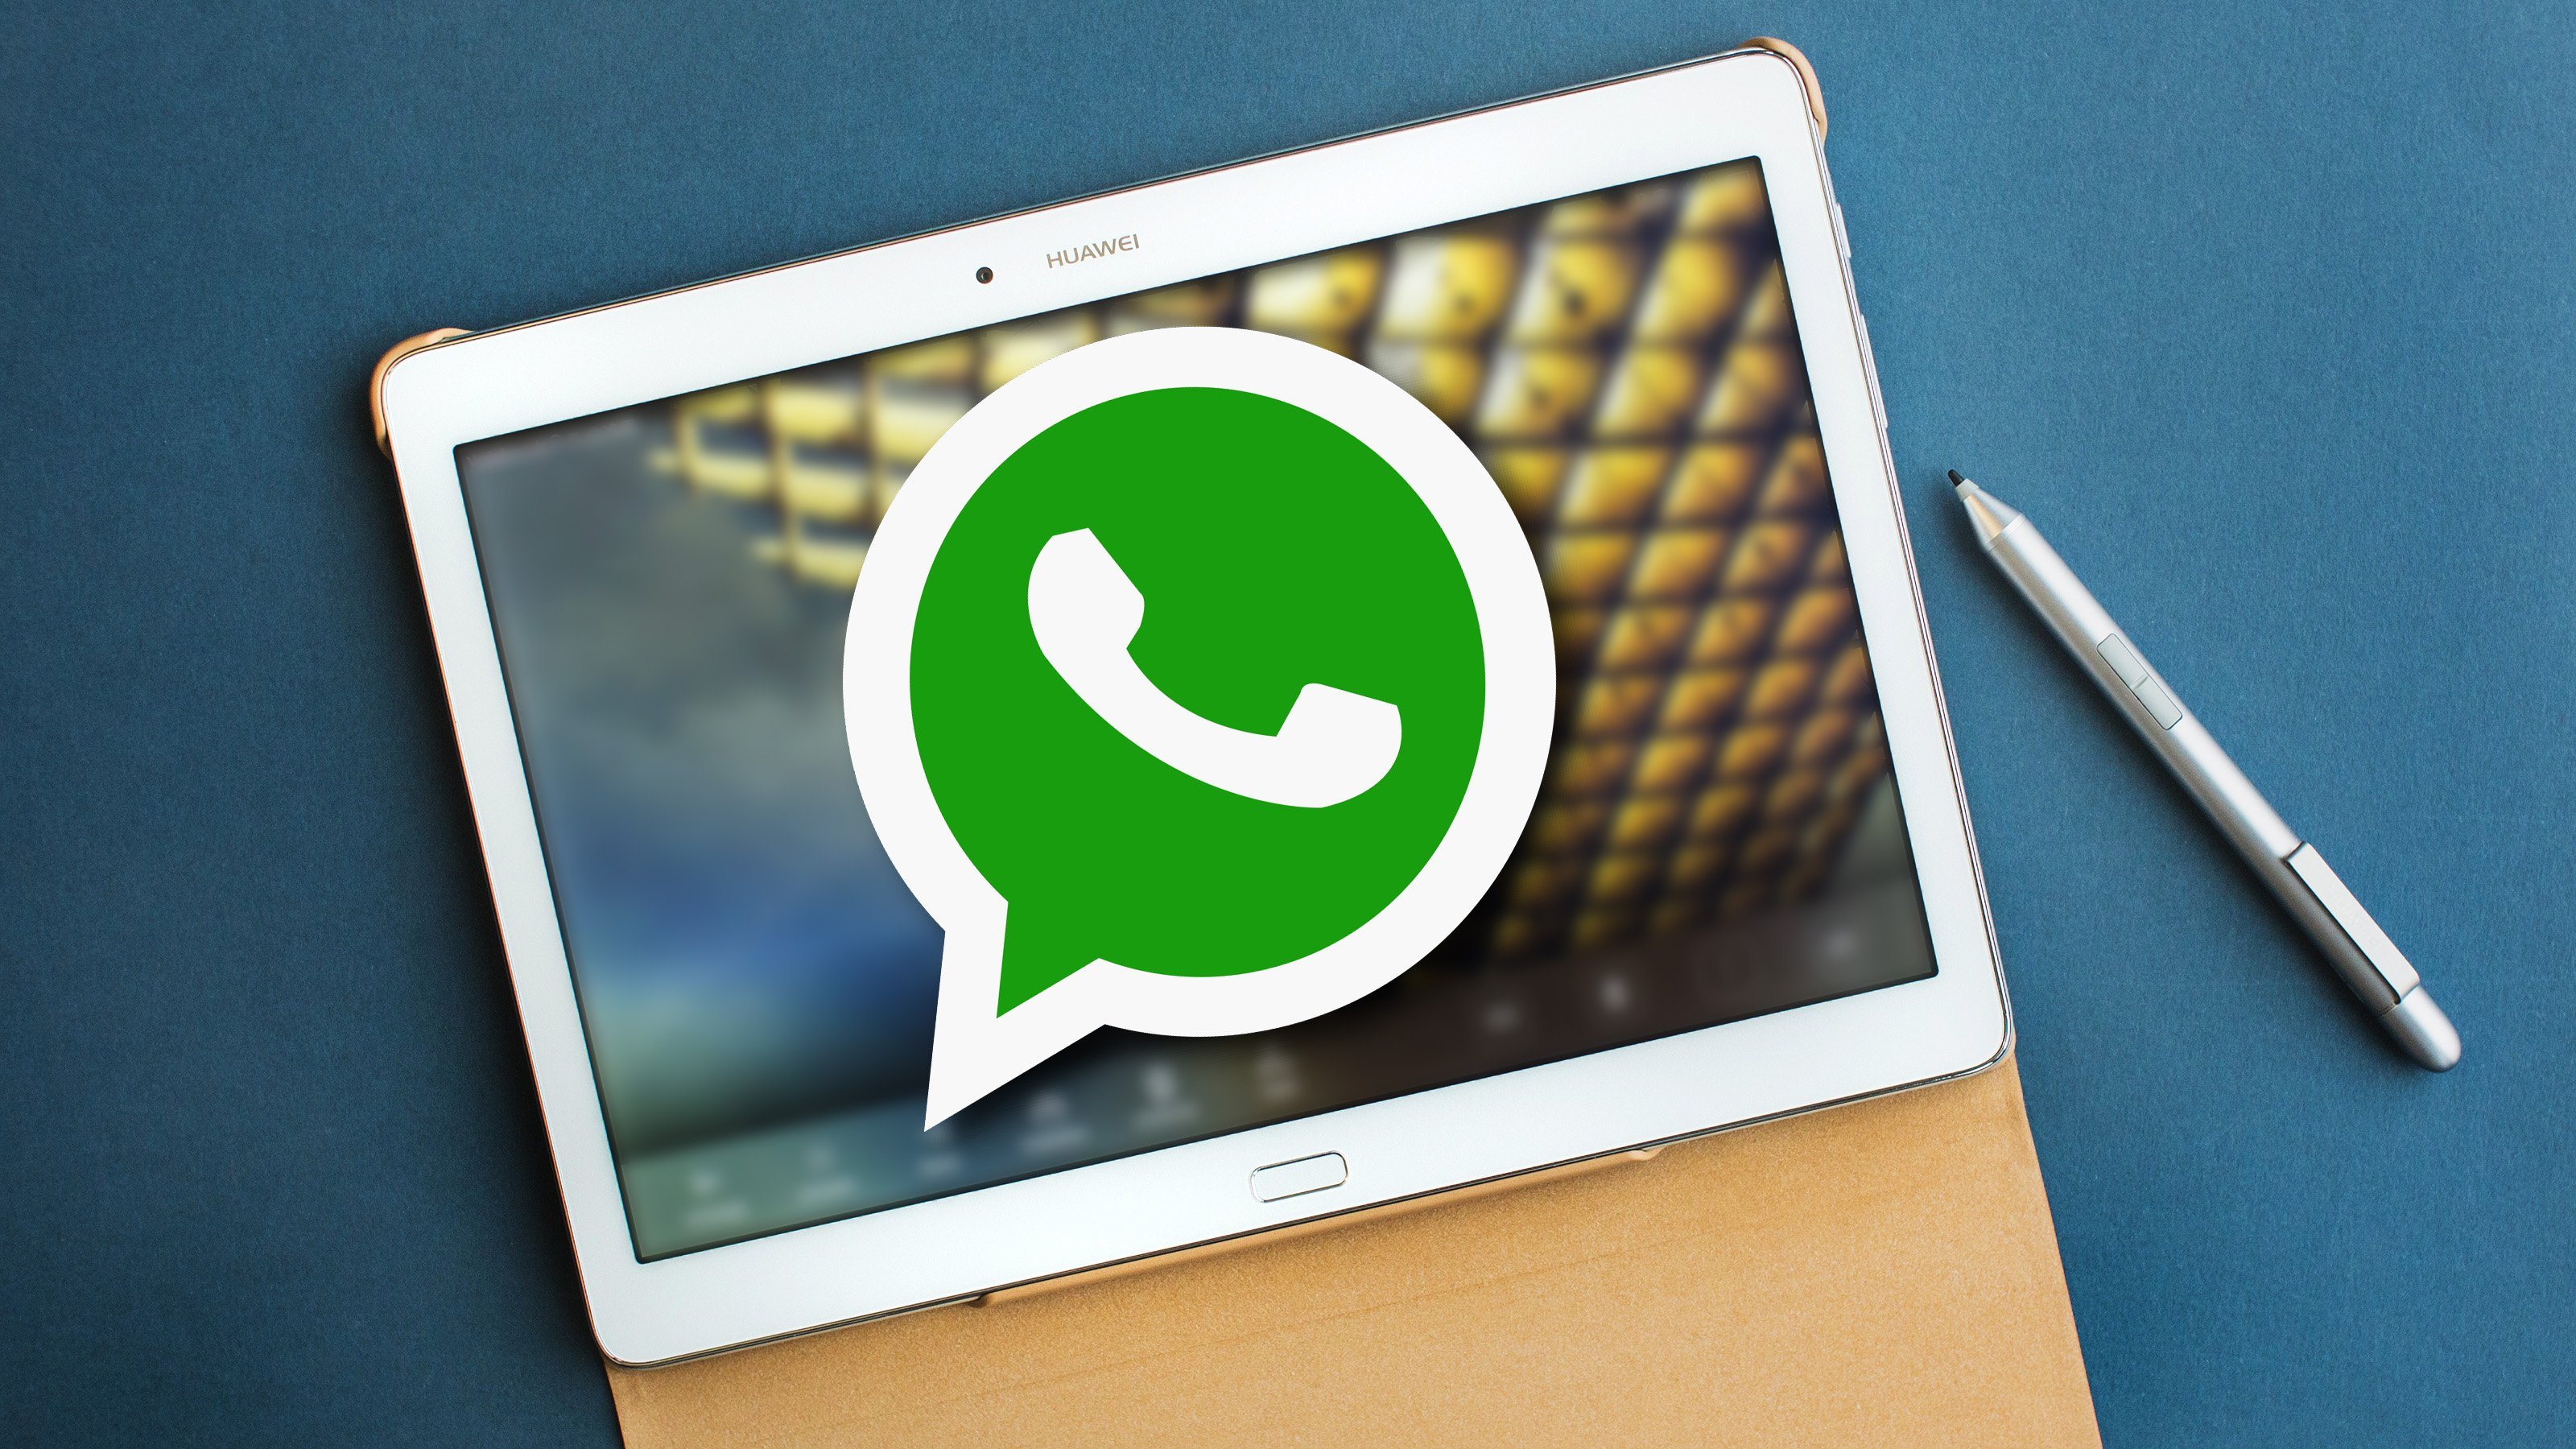 Download whatsapp for huawei p smart